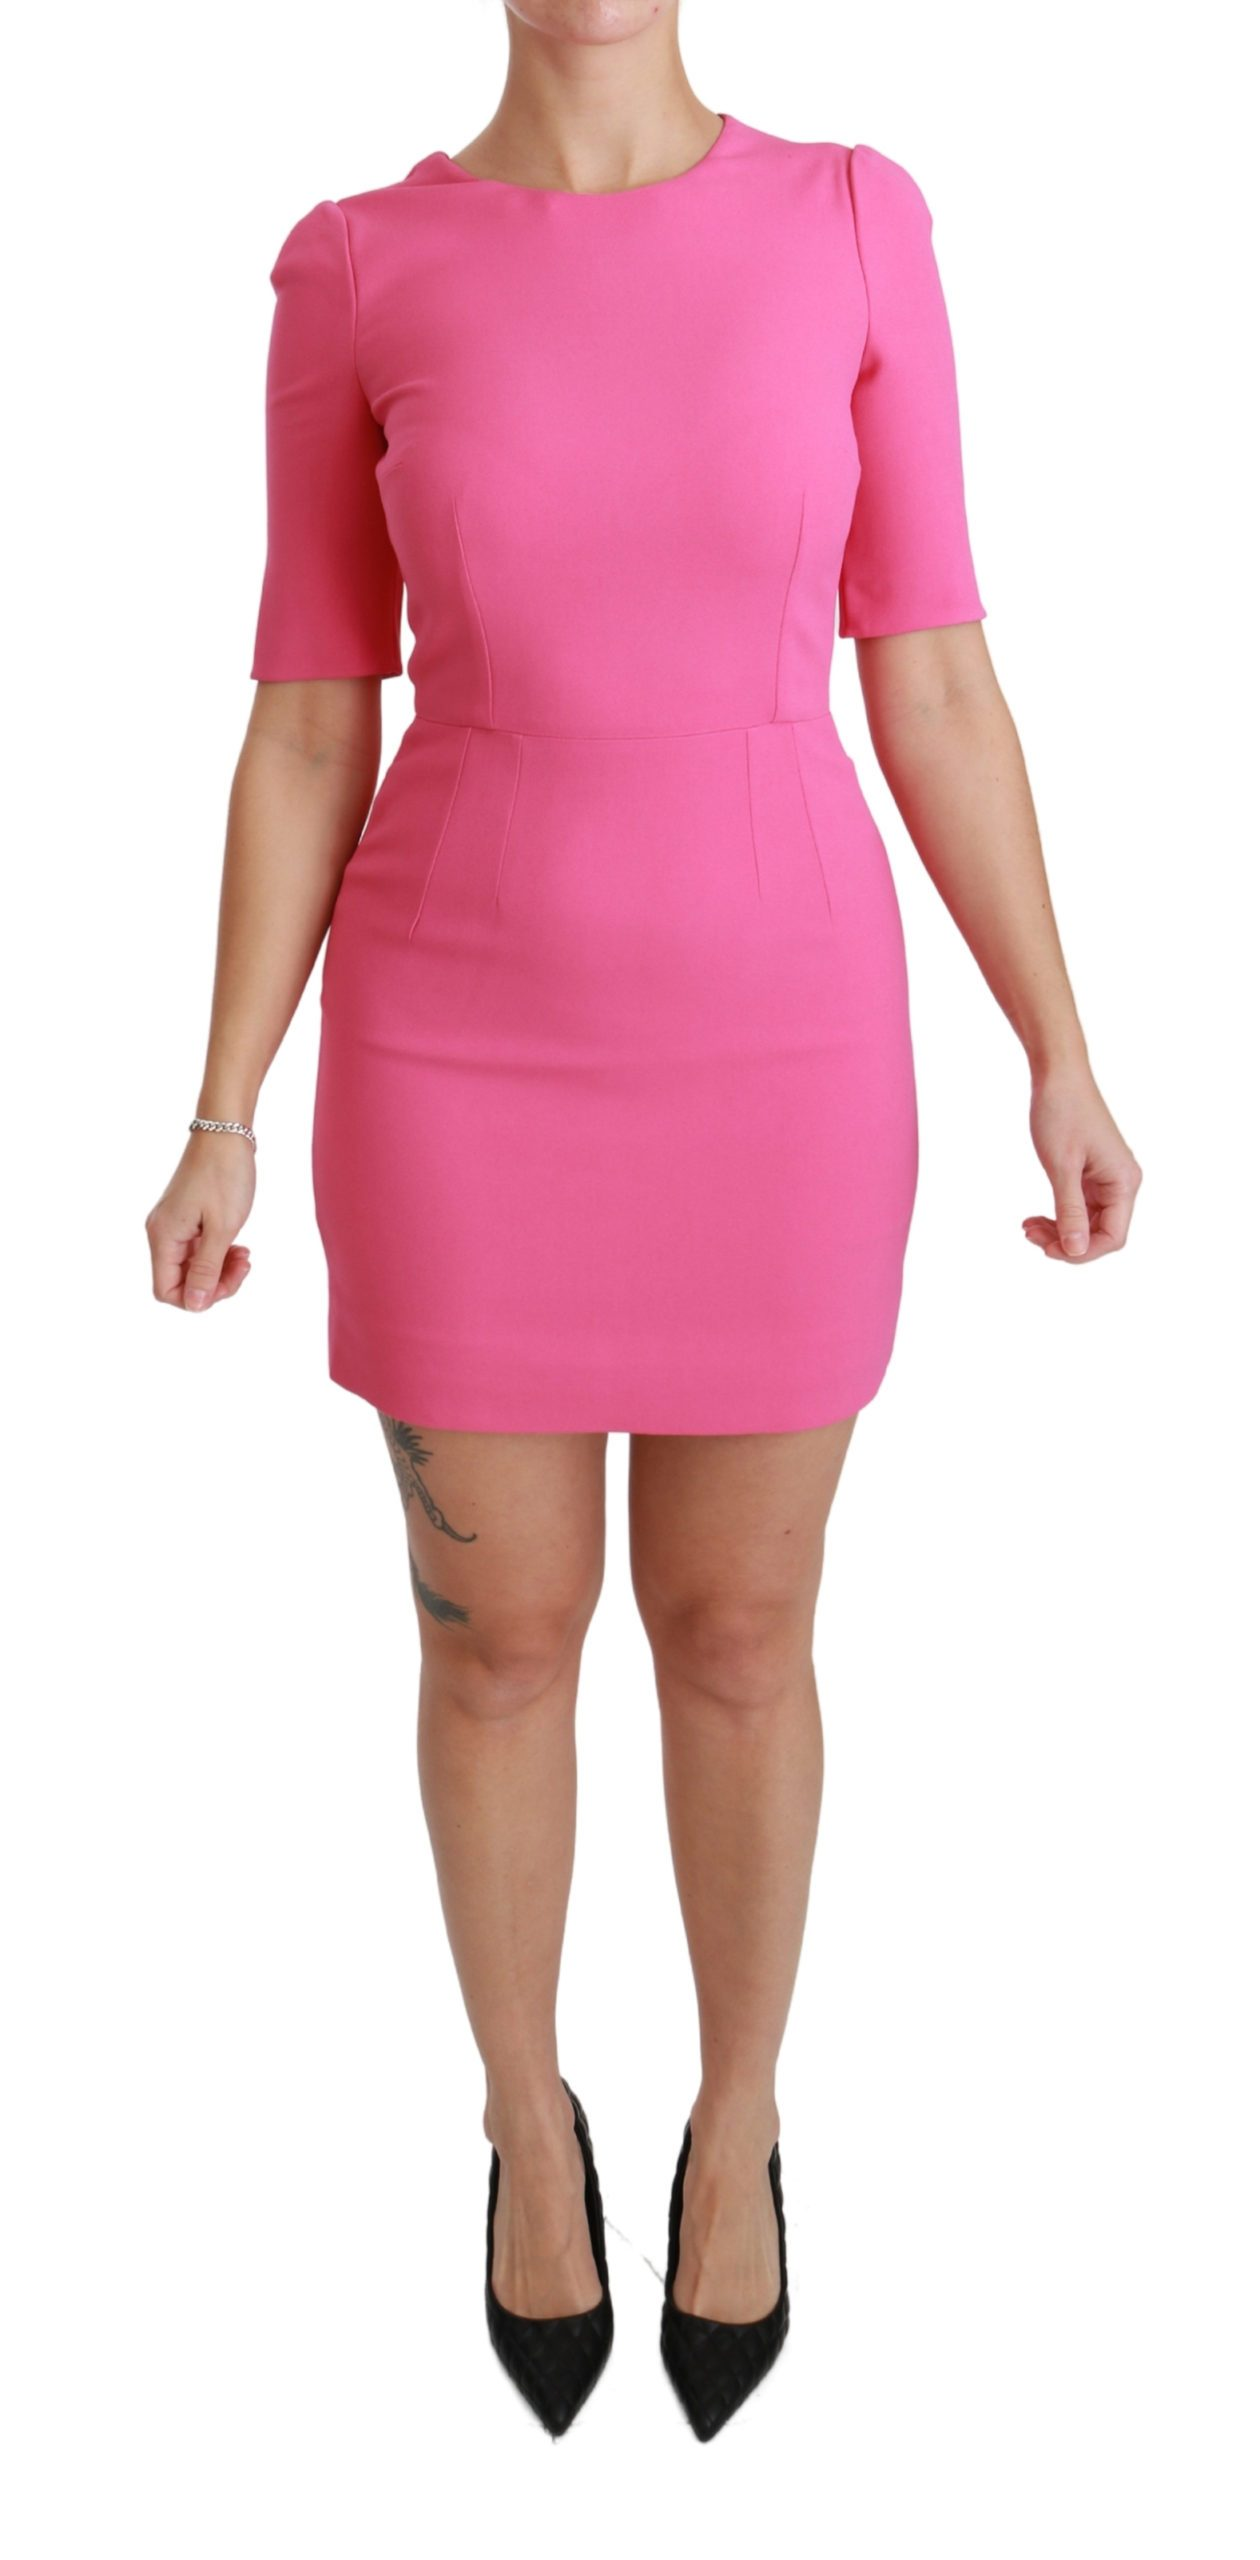 Dolce & Gabbana Women's Stretch Sheath Mini Dress Pink DR2467 - IT36 | XS